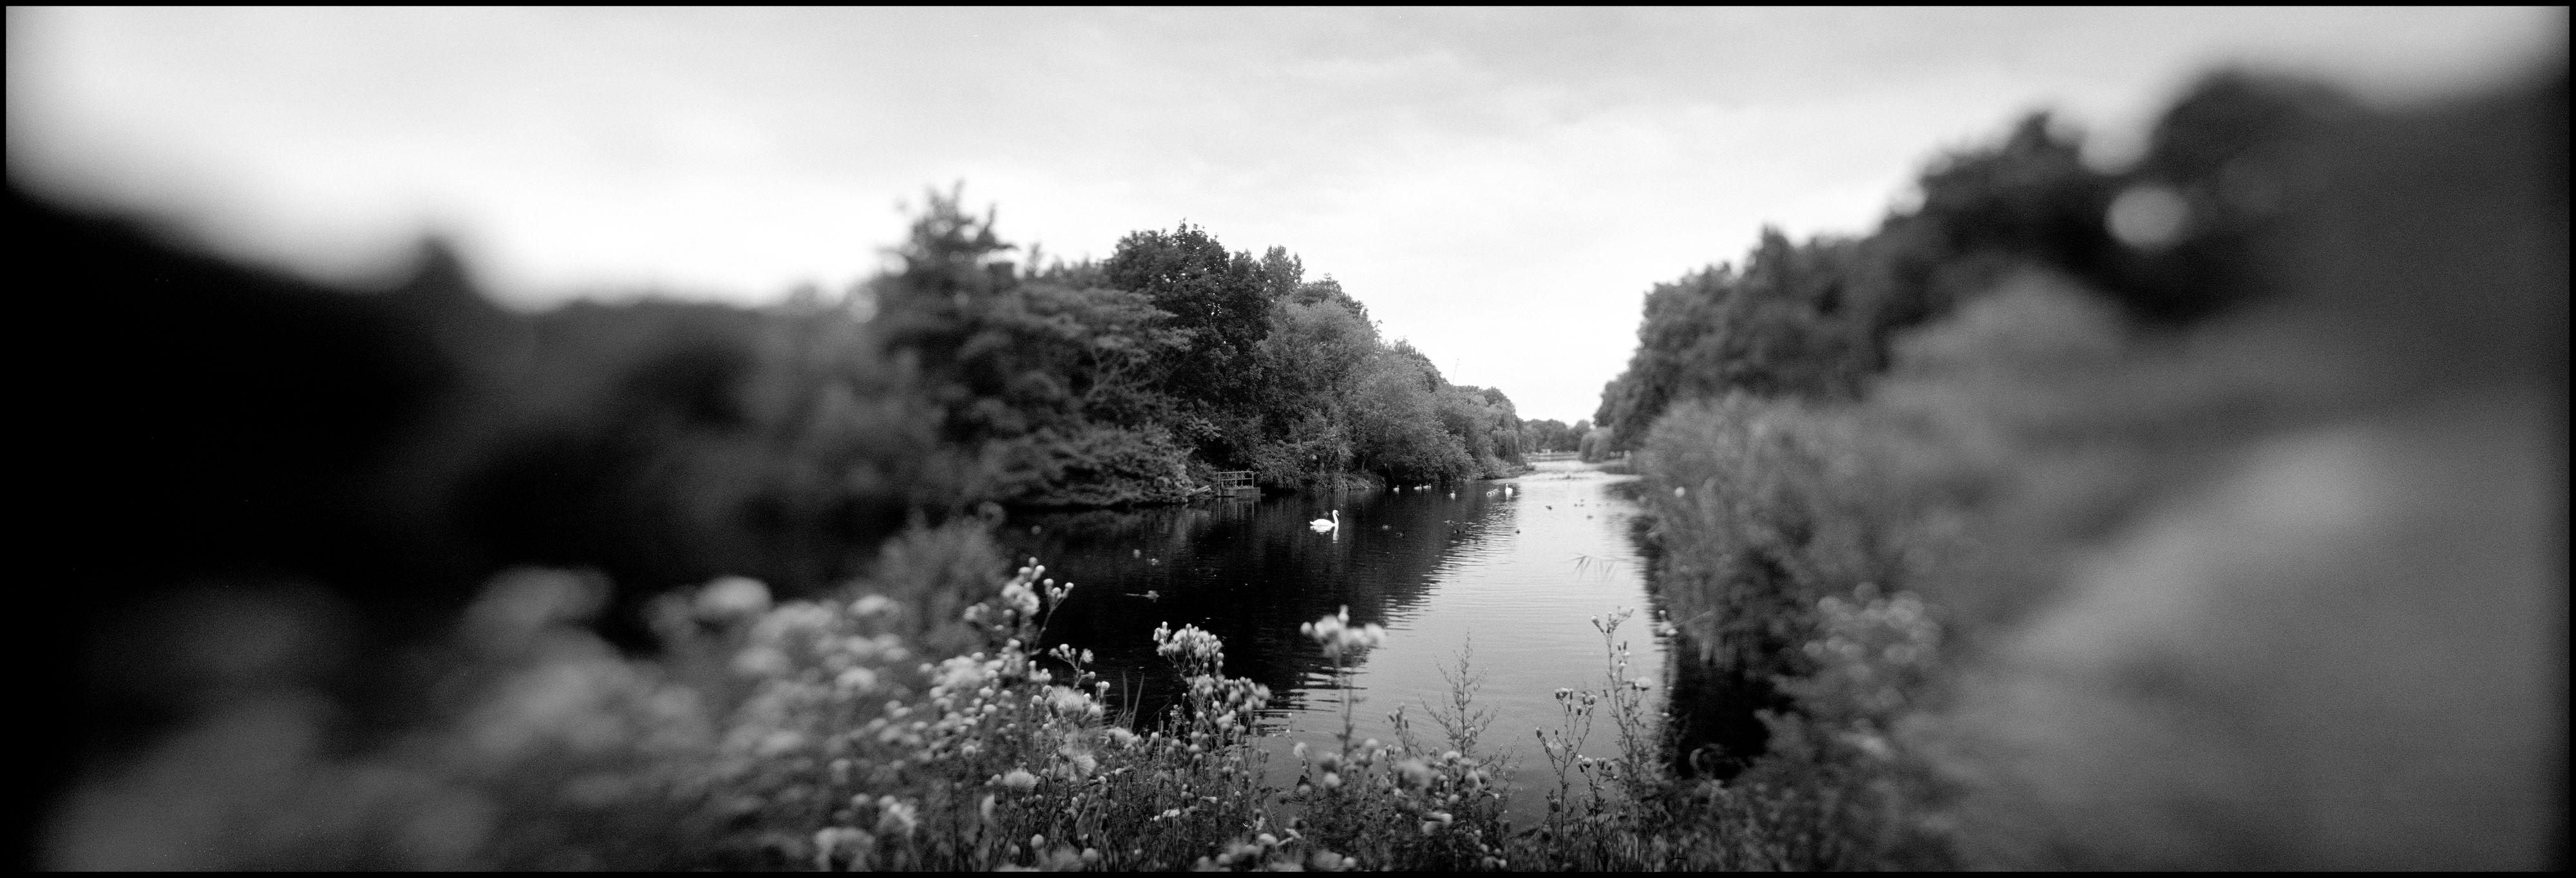 Duck Island, England.jpg